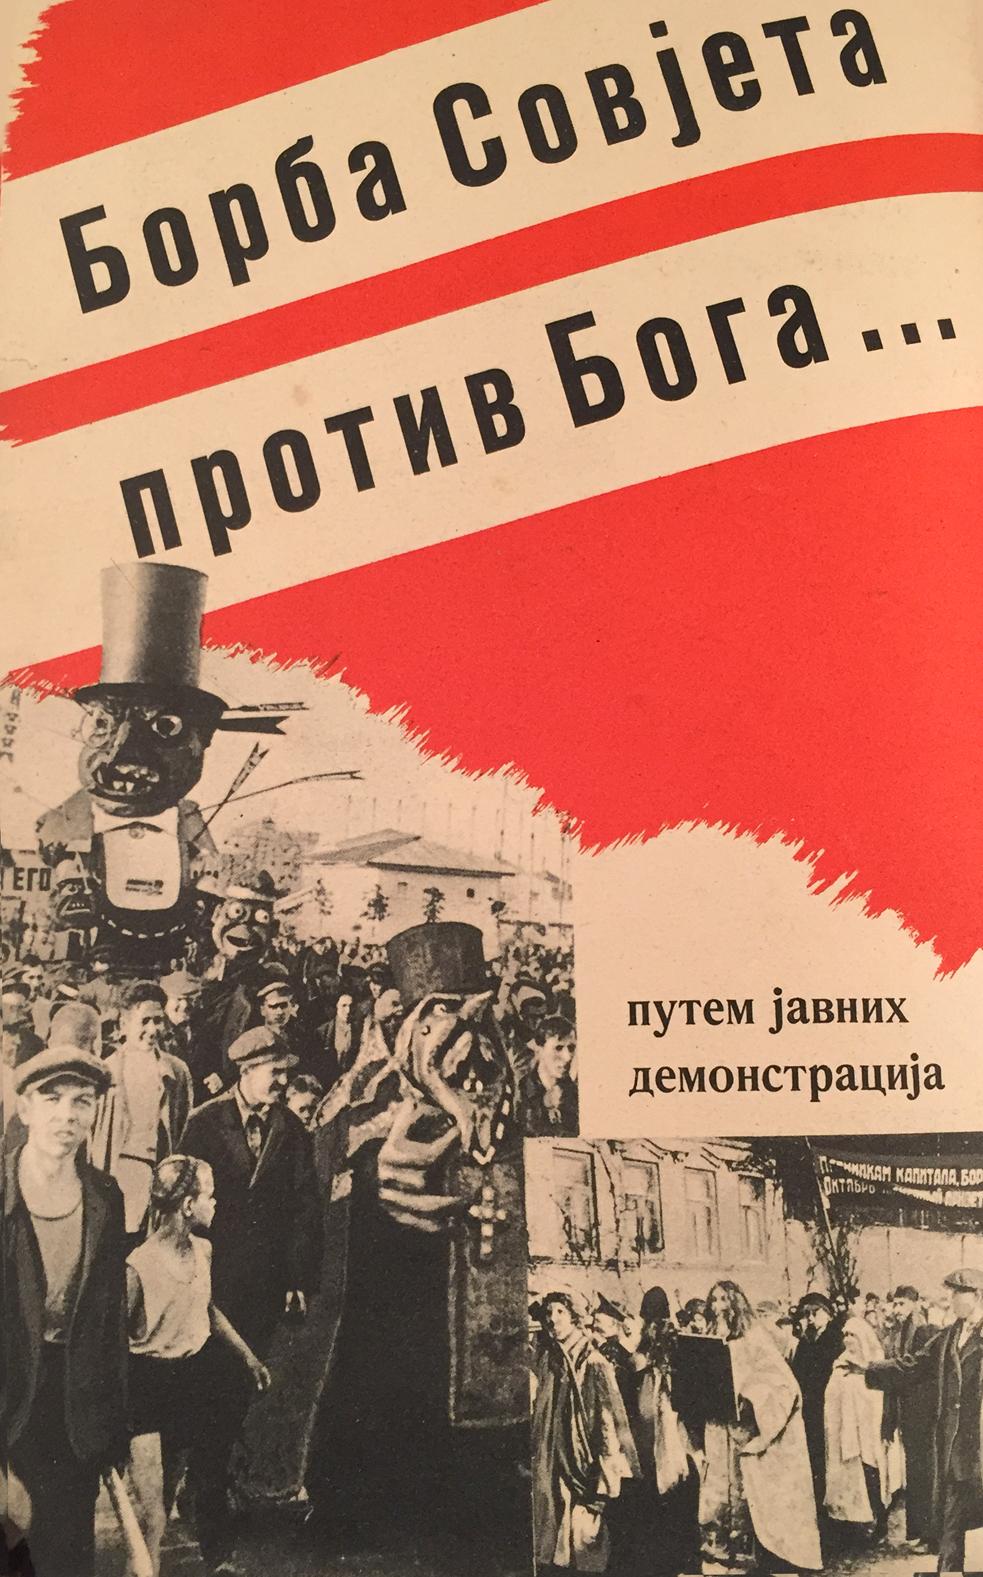 Borba Sovjeta protiv Boga : Nemački propagandni materijal iz Drugog svetskog rata (HQ)